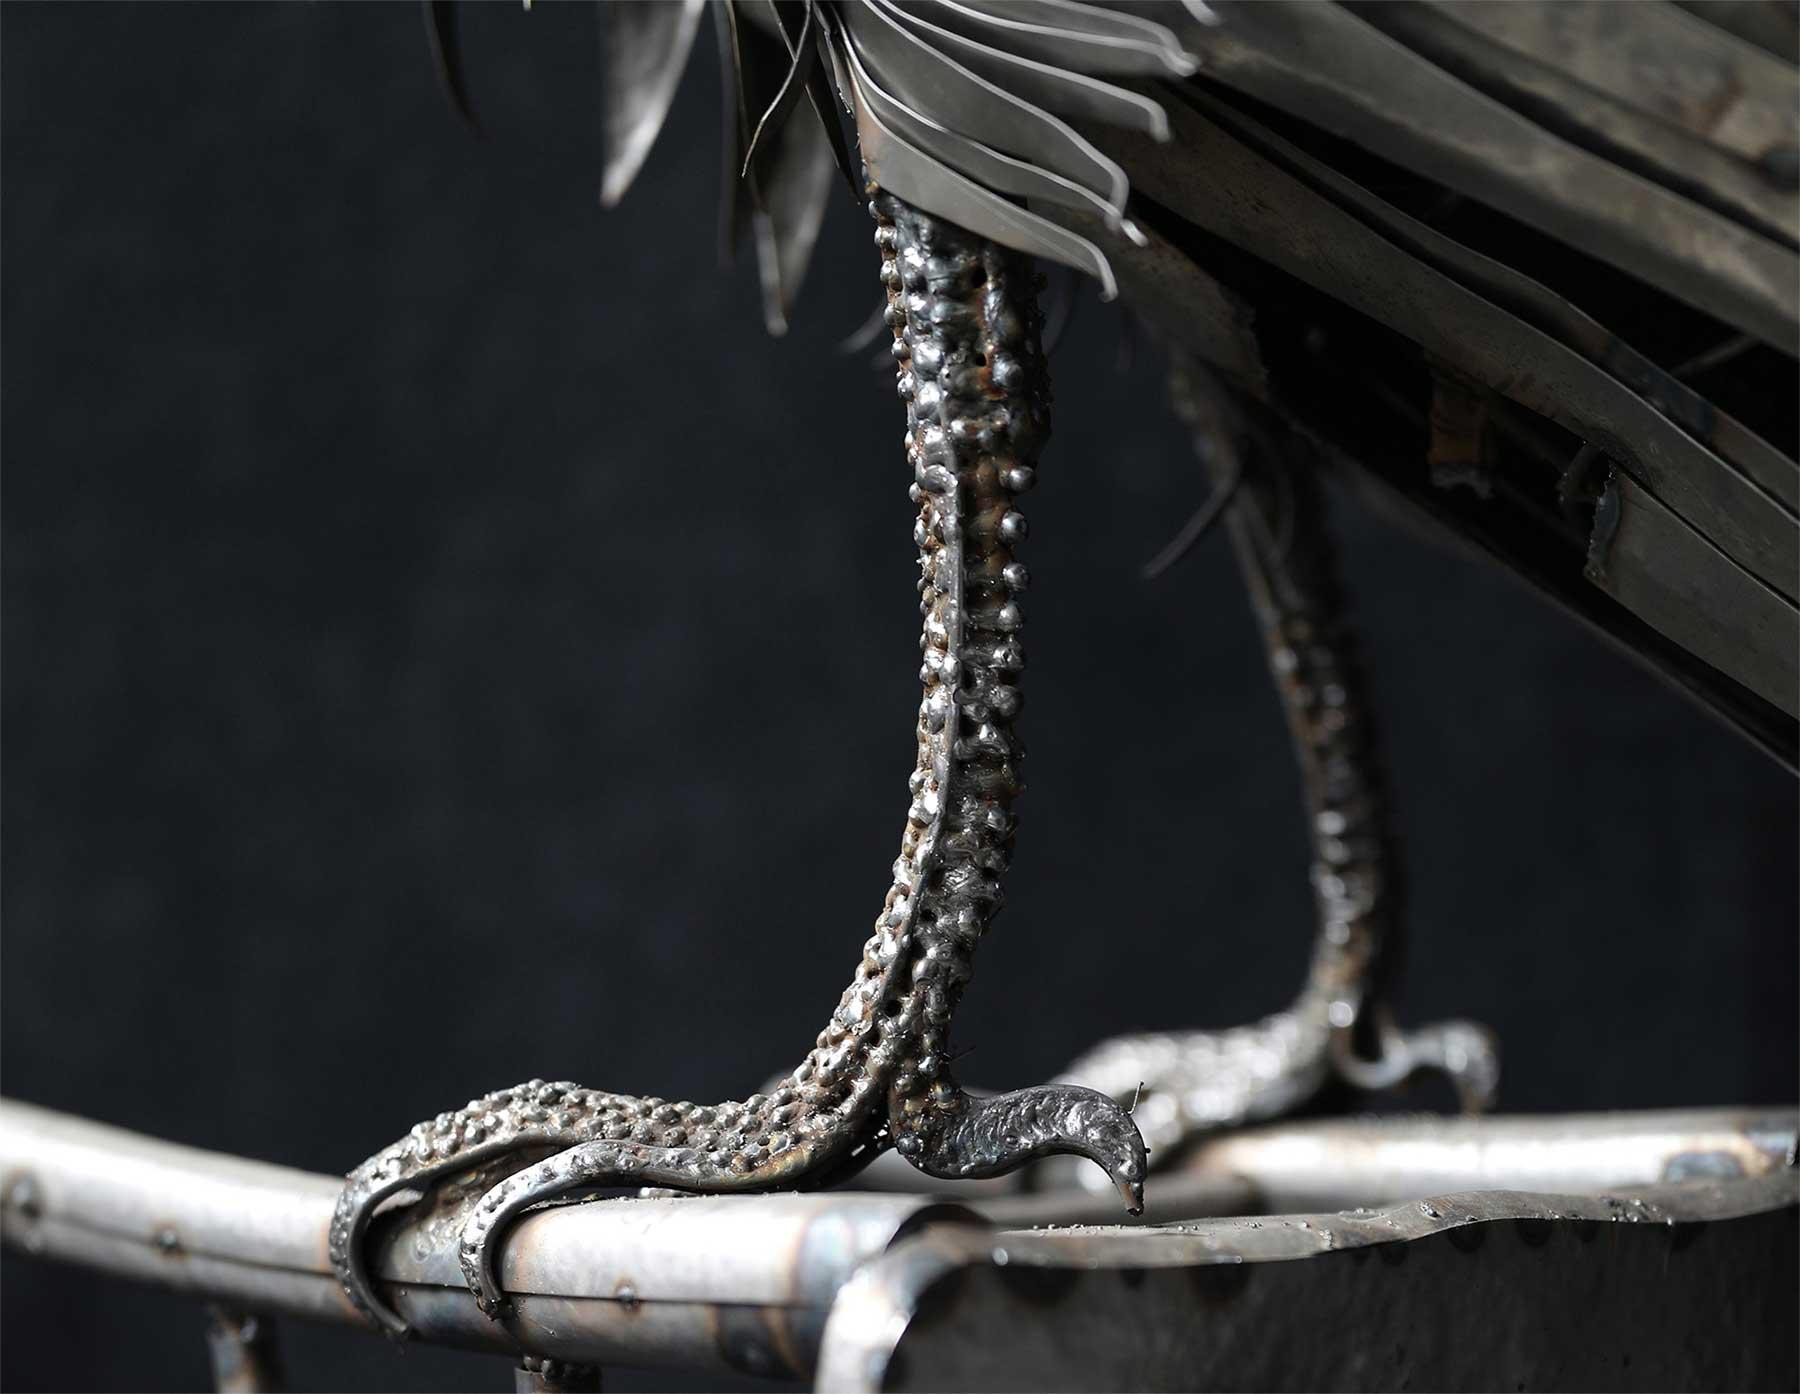 Geniale Altmetall-Skulpturen von Selçuk Yılmaz selcuk-yilmaz-metallskulpturen-2020_07